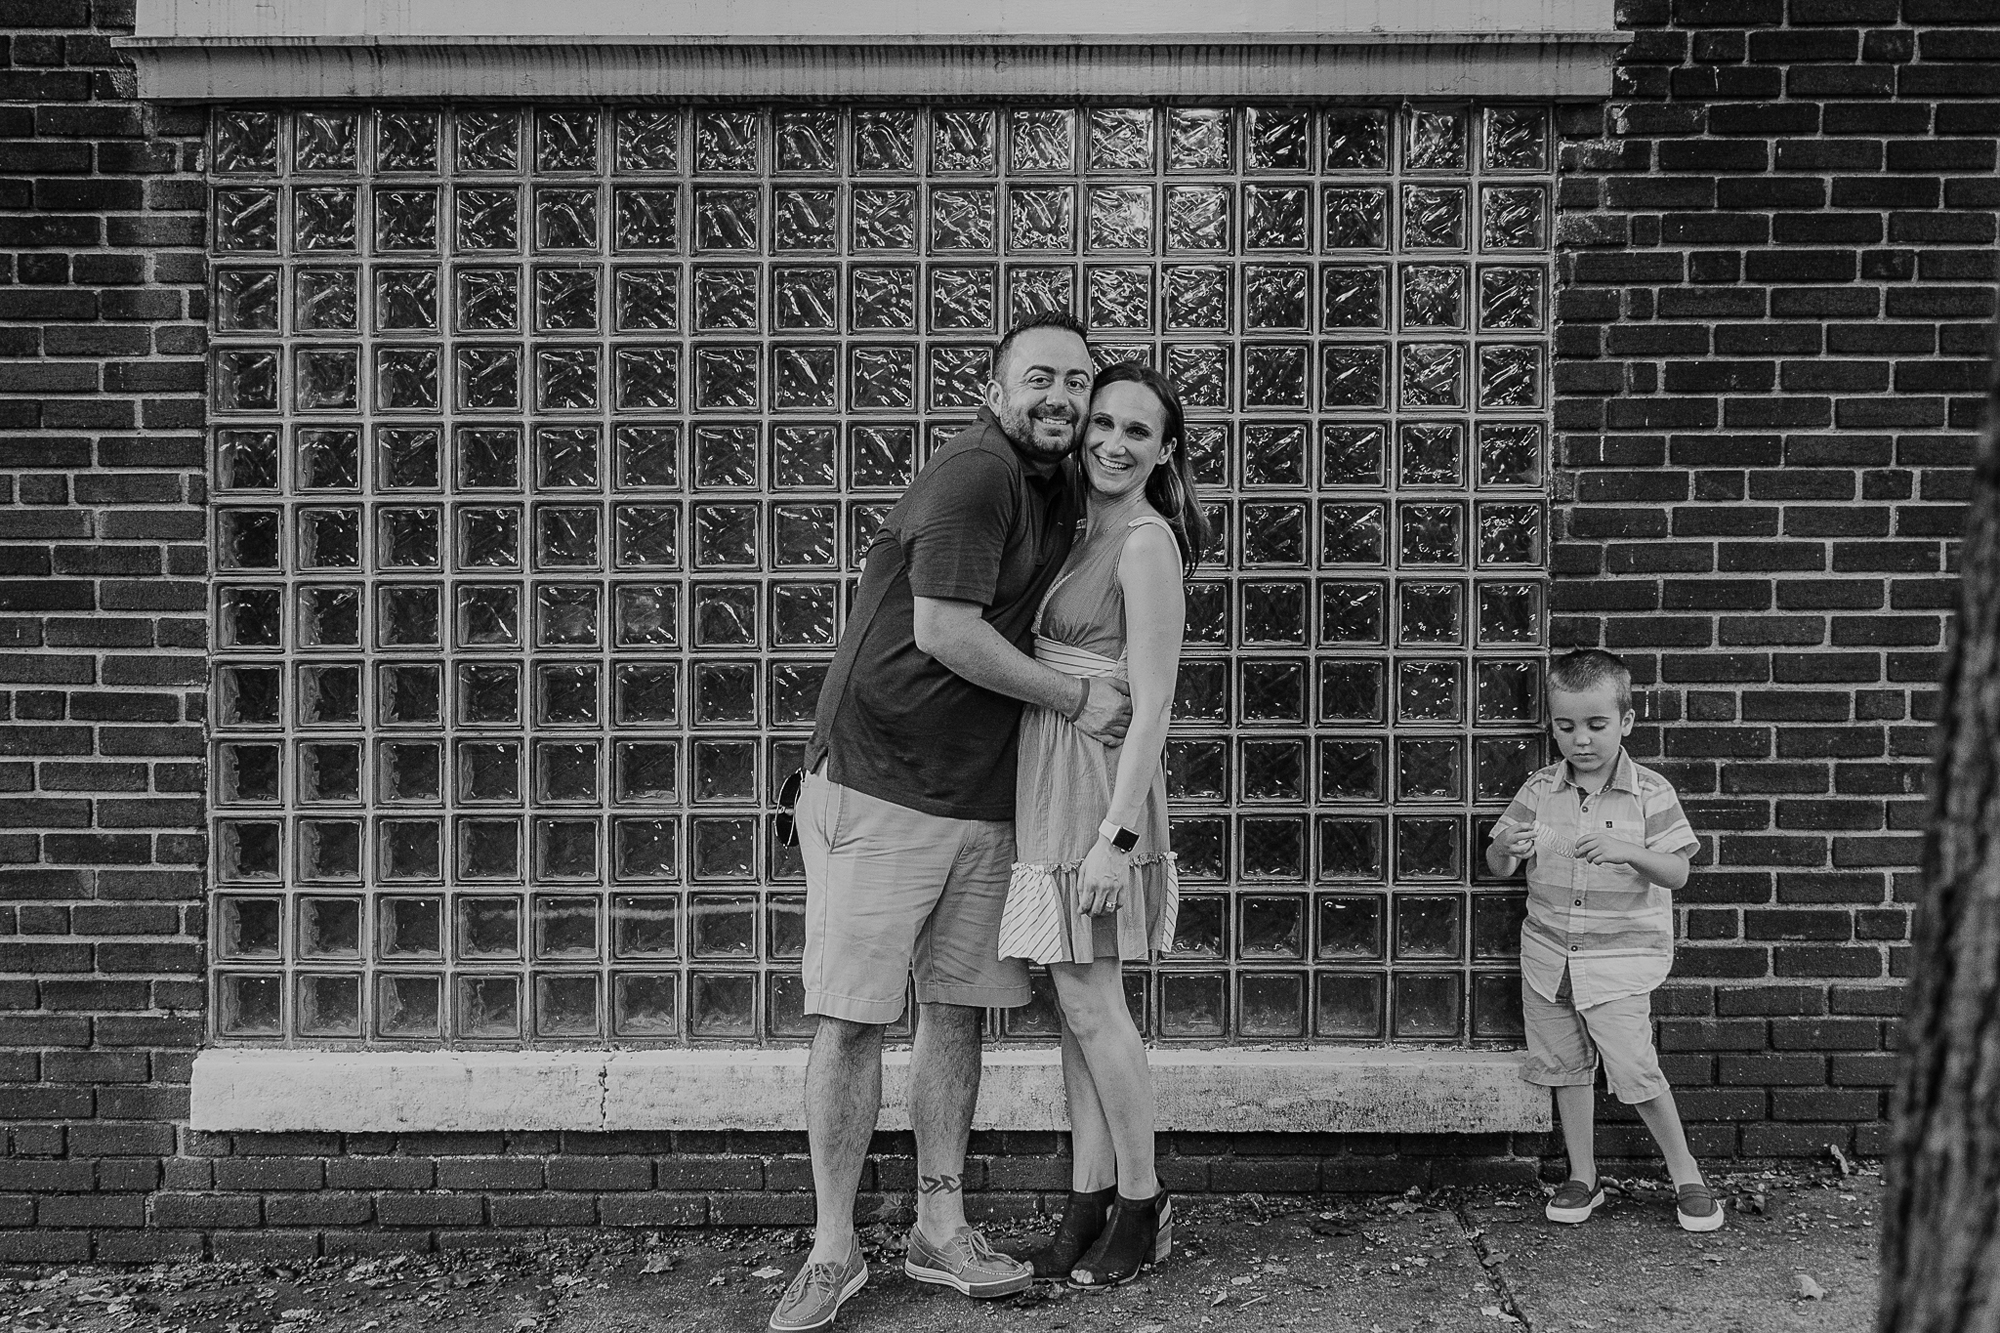 018-oldtown_alexandria_family_photography.jpg